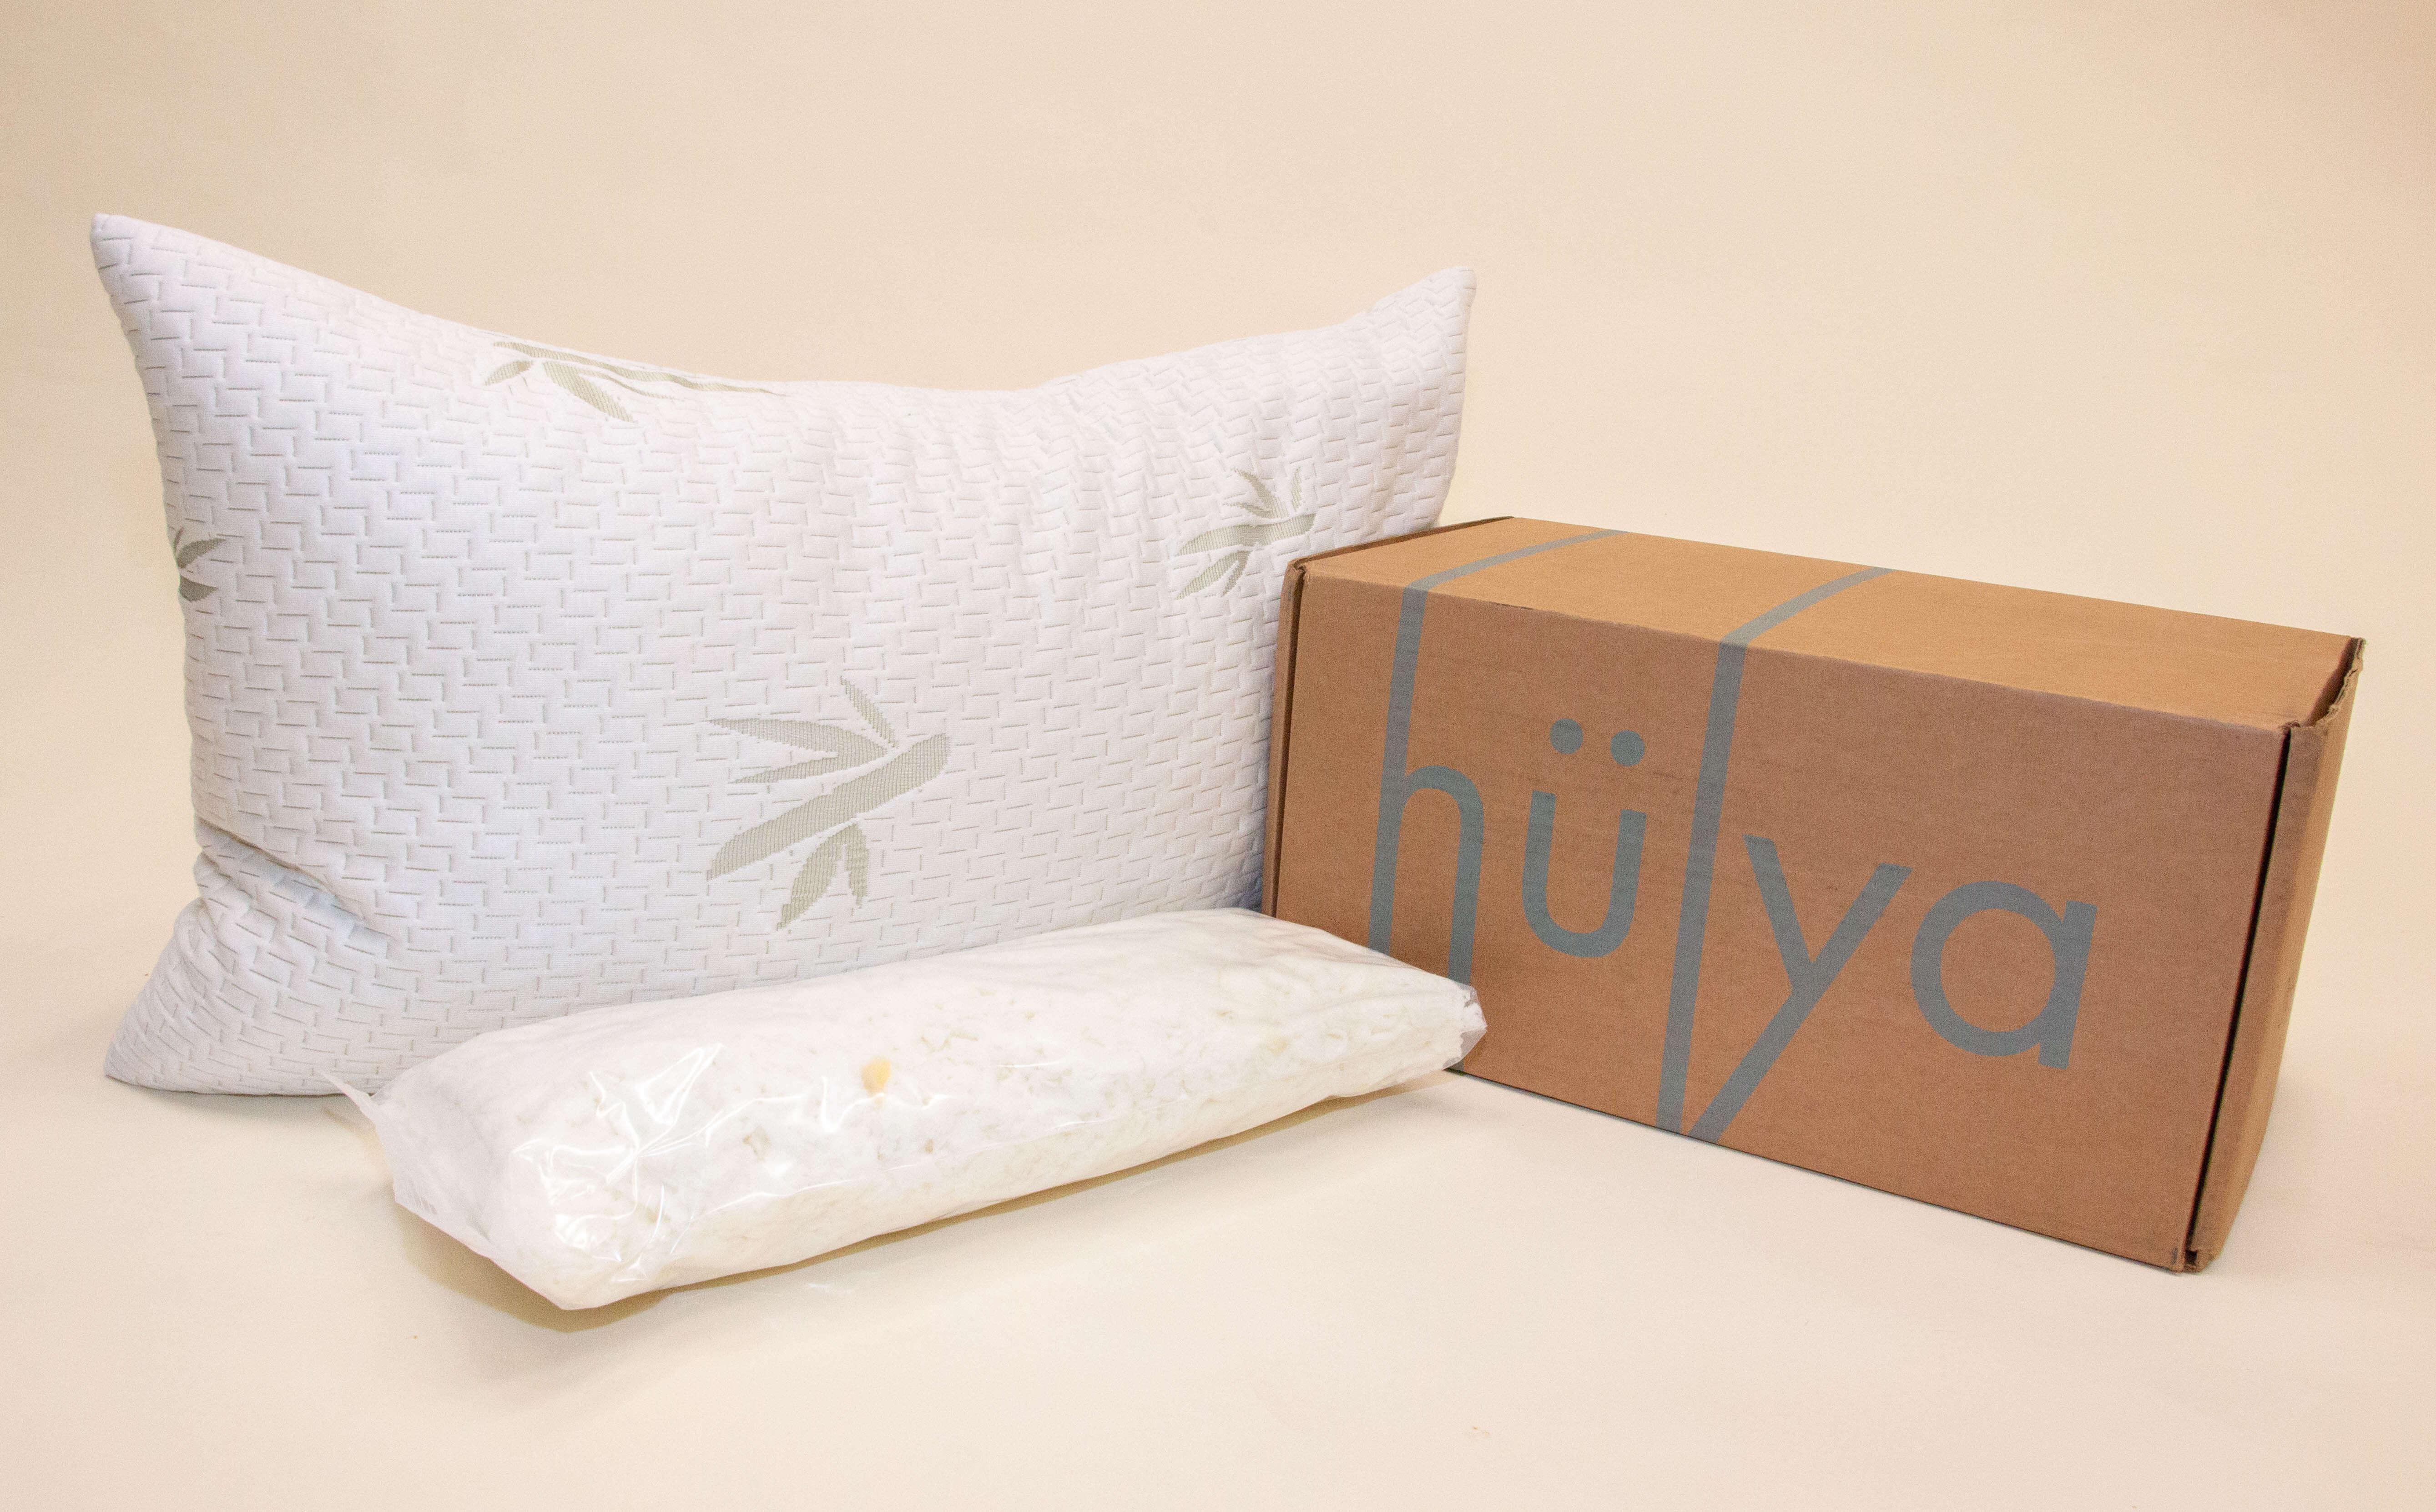 Green Gift Guide - Pillow